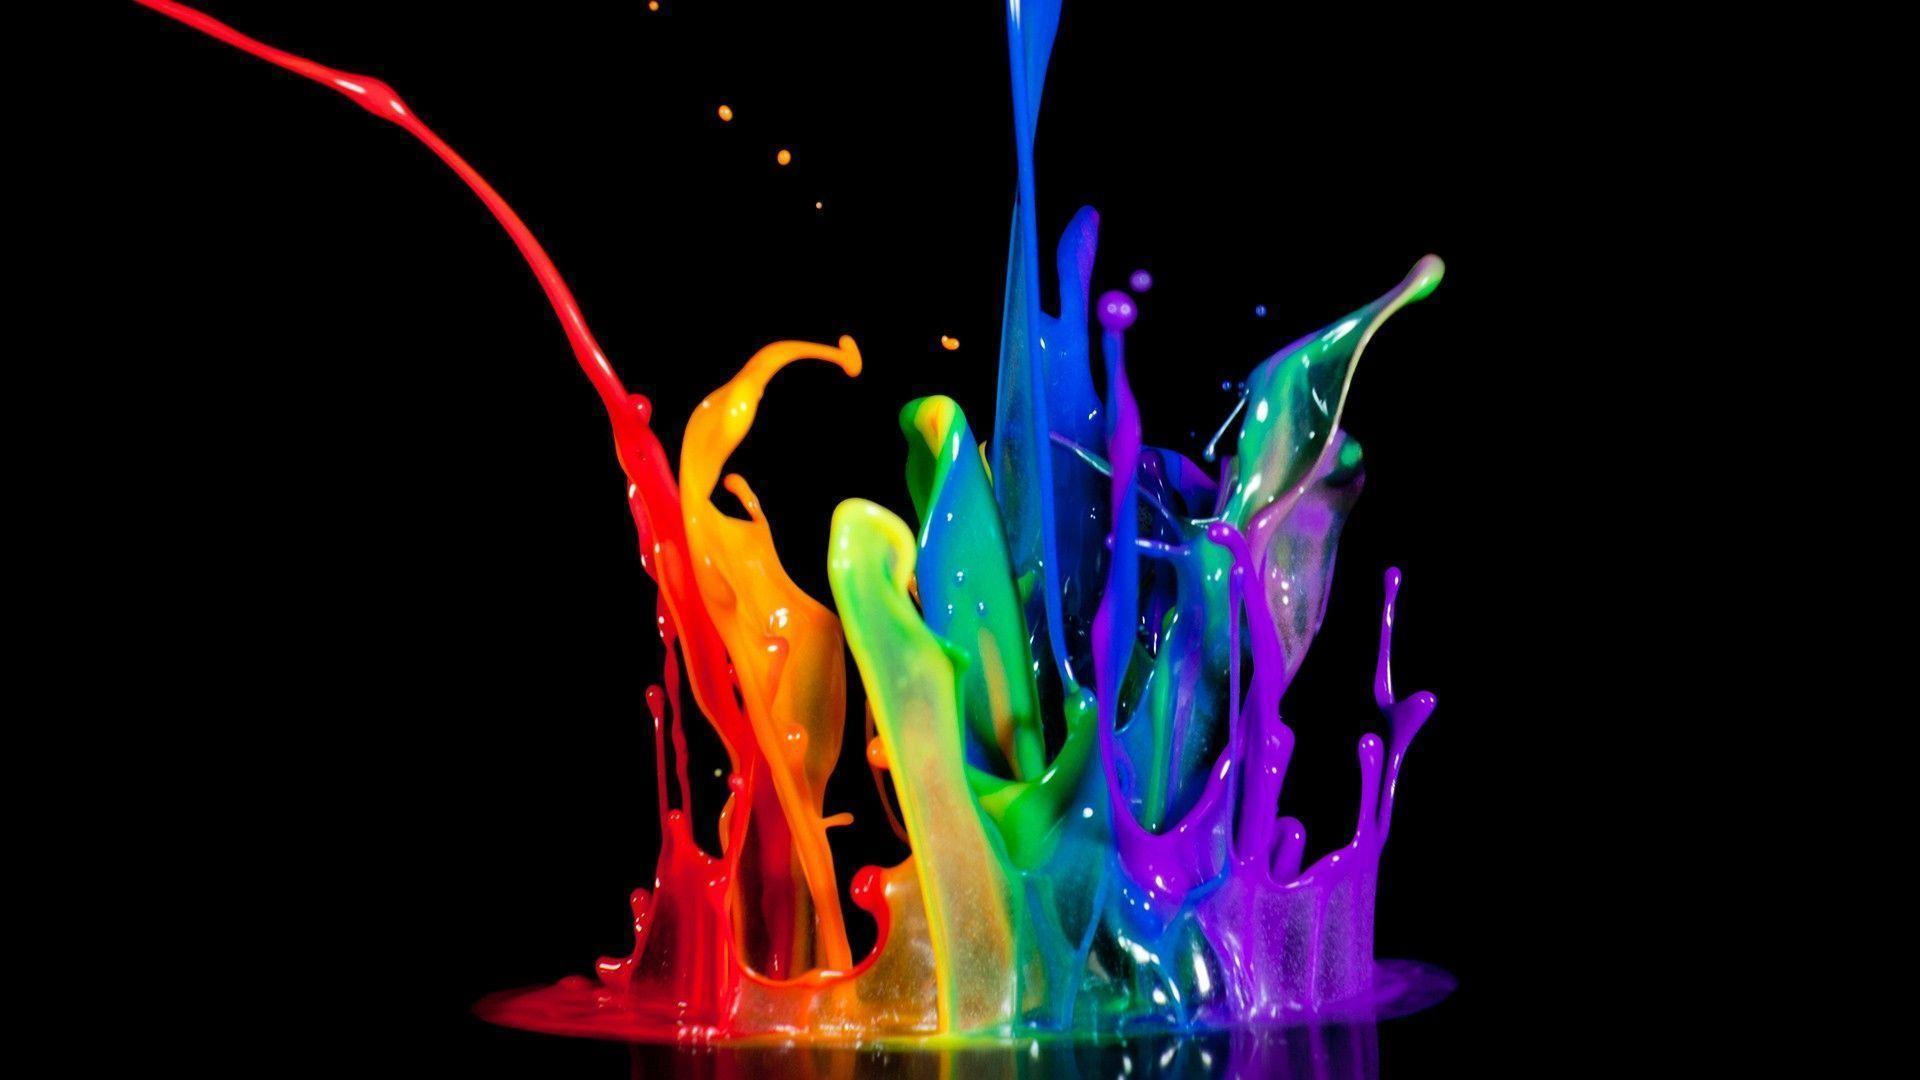 splash of color hd - photo #1